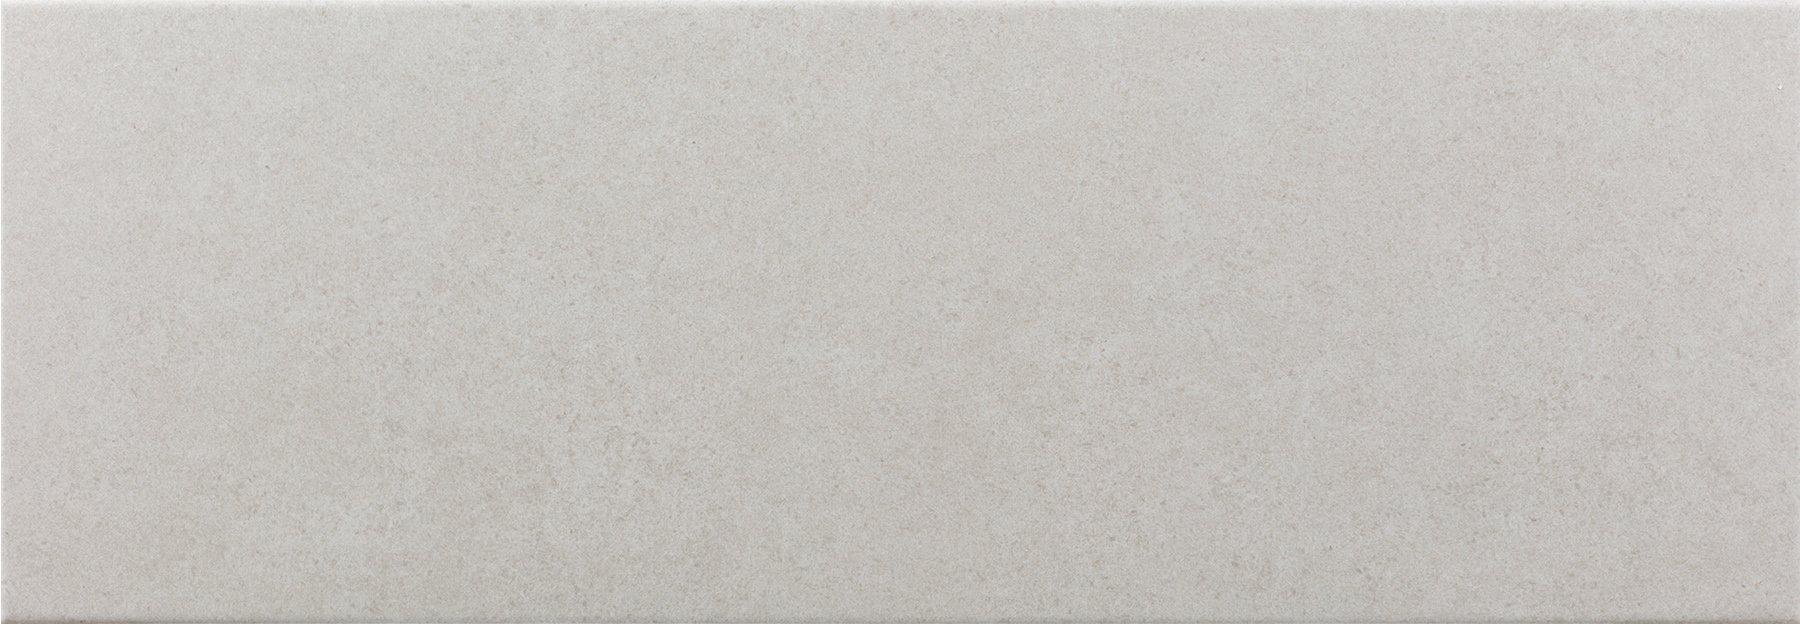 Faianță pentru baie Navarti Rodano Perla 250x700 satin gri / 9